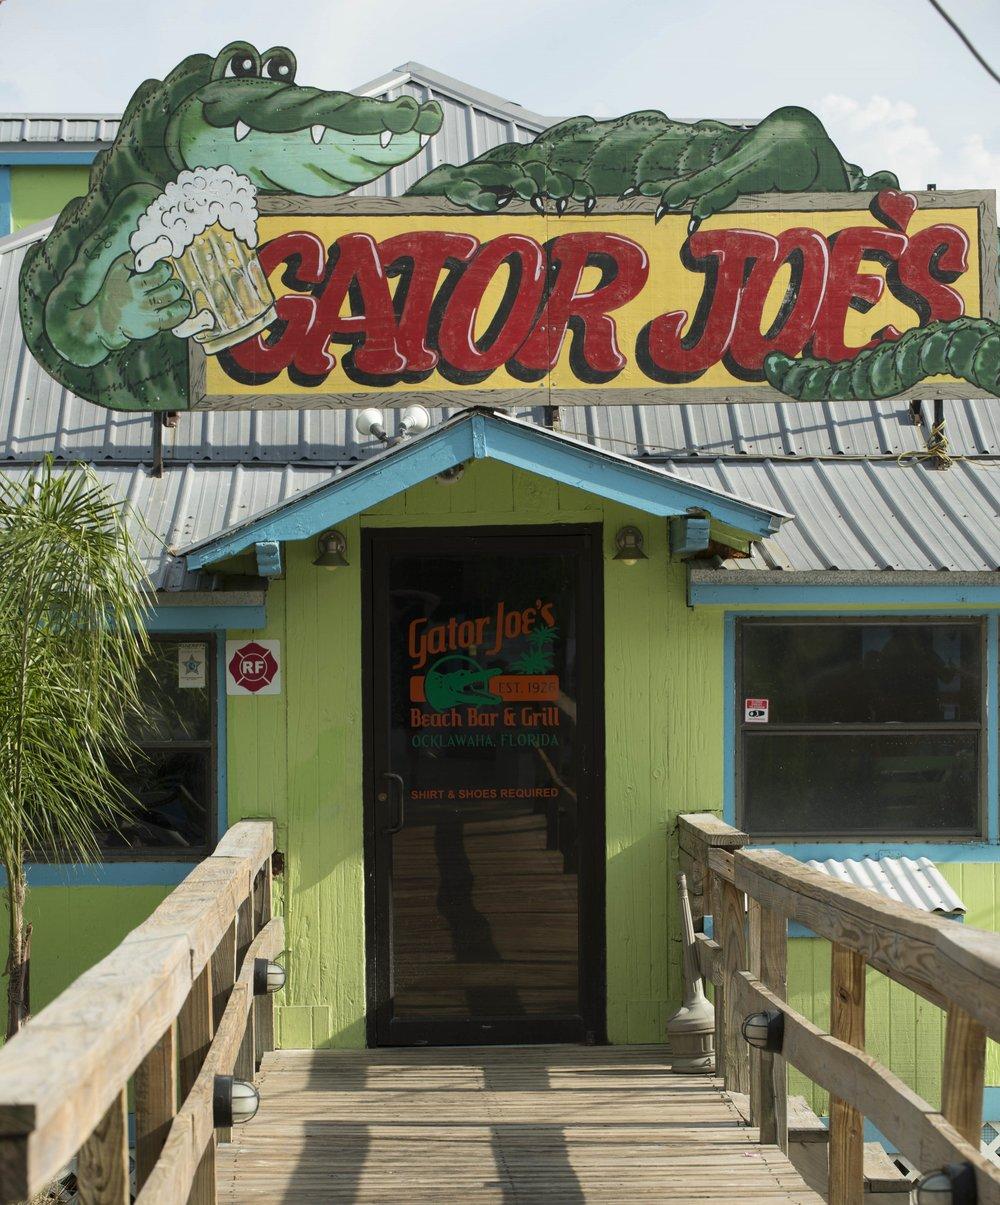 Ocala Post - Gator Joe's, high priority violations